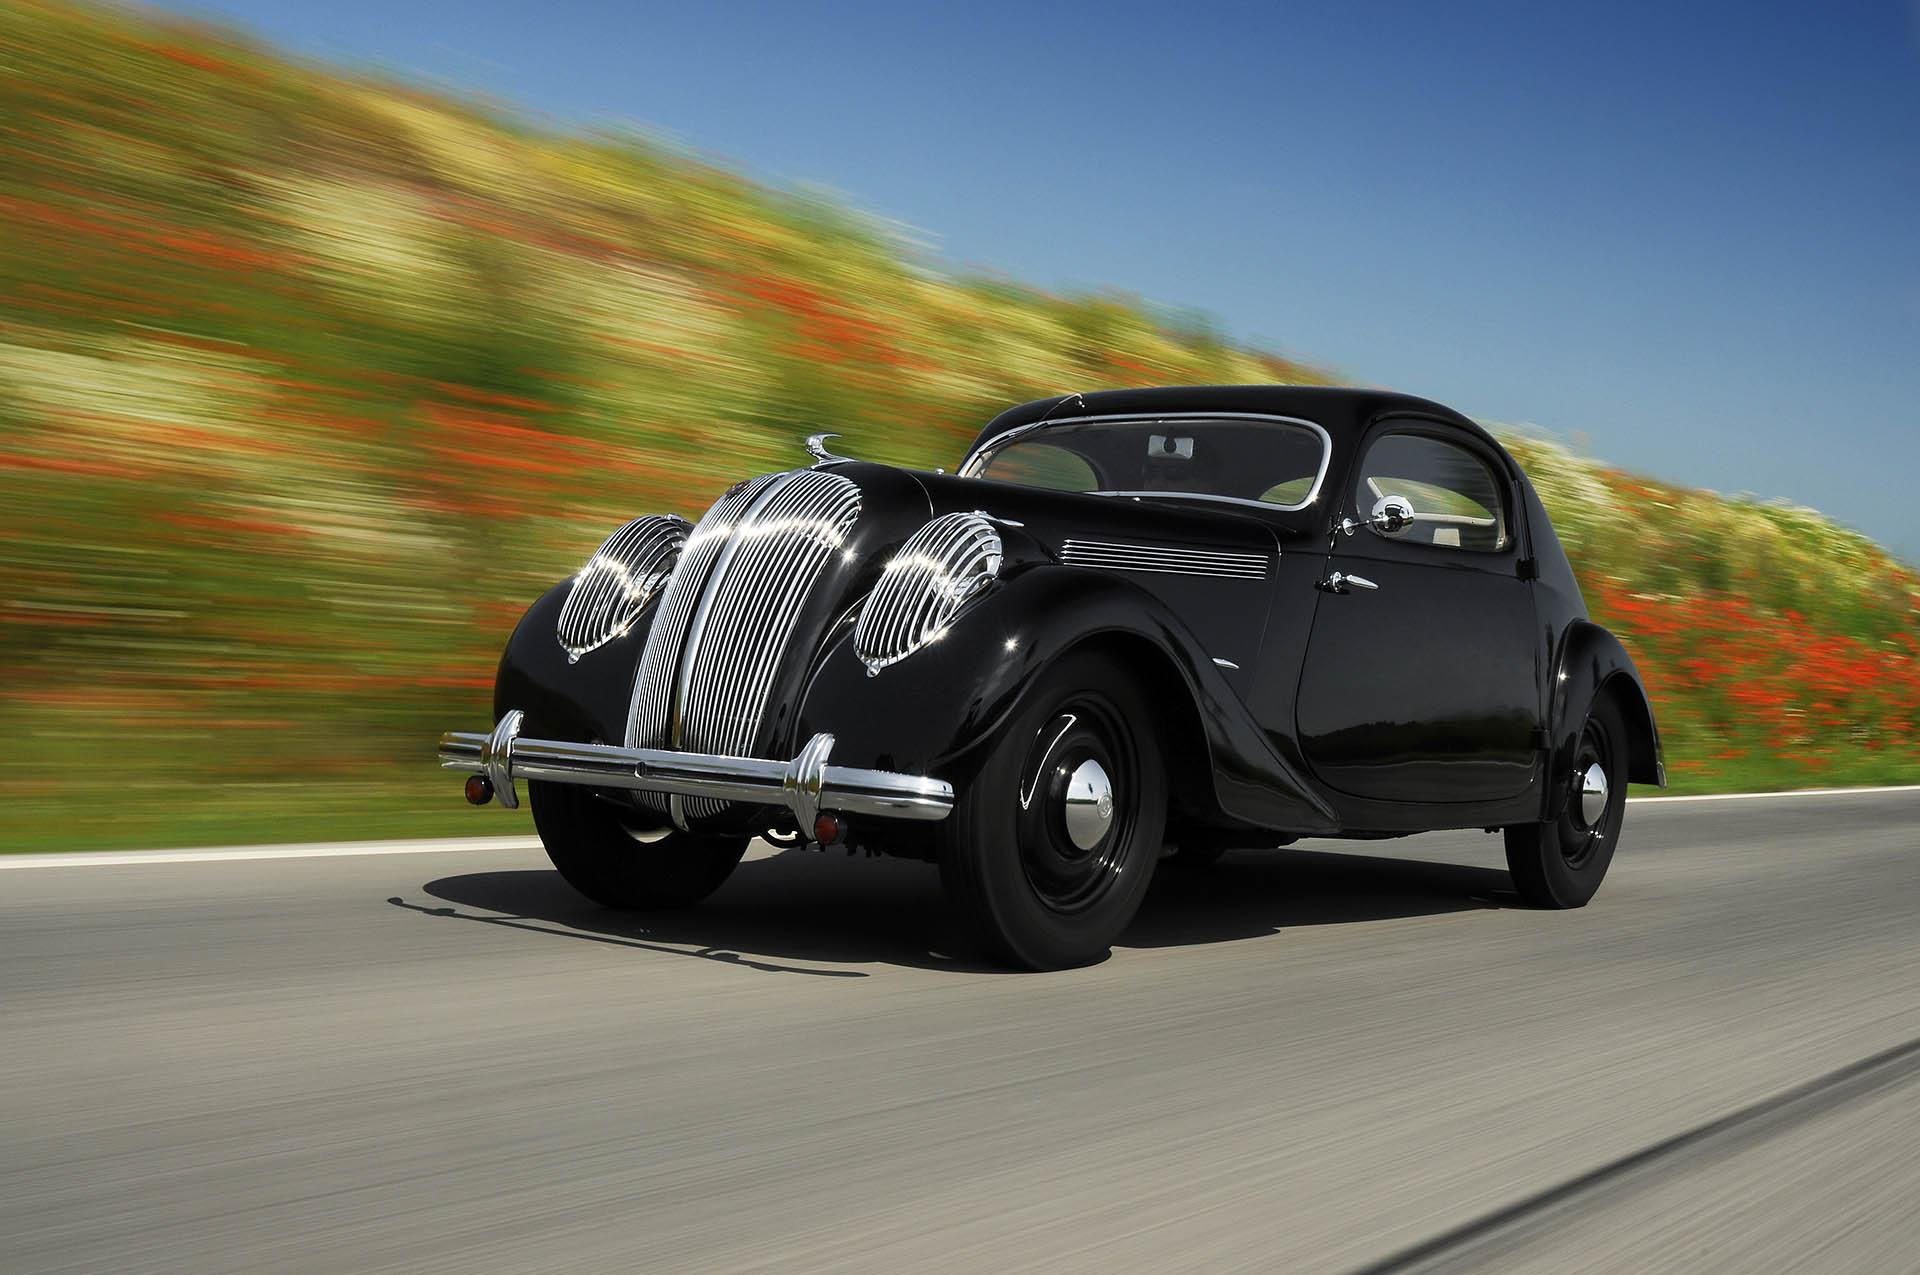 Škoda Monte Carlo modellek